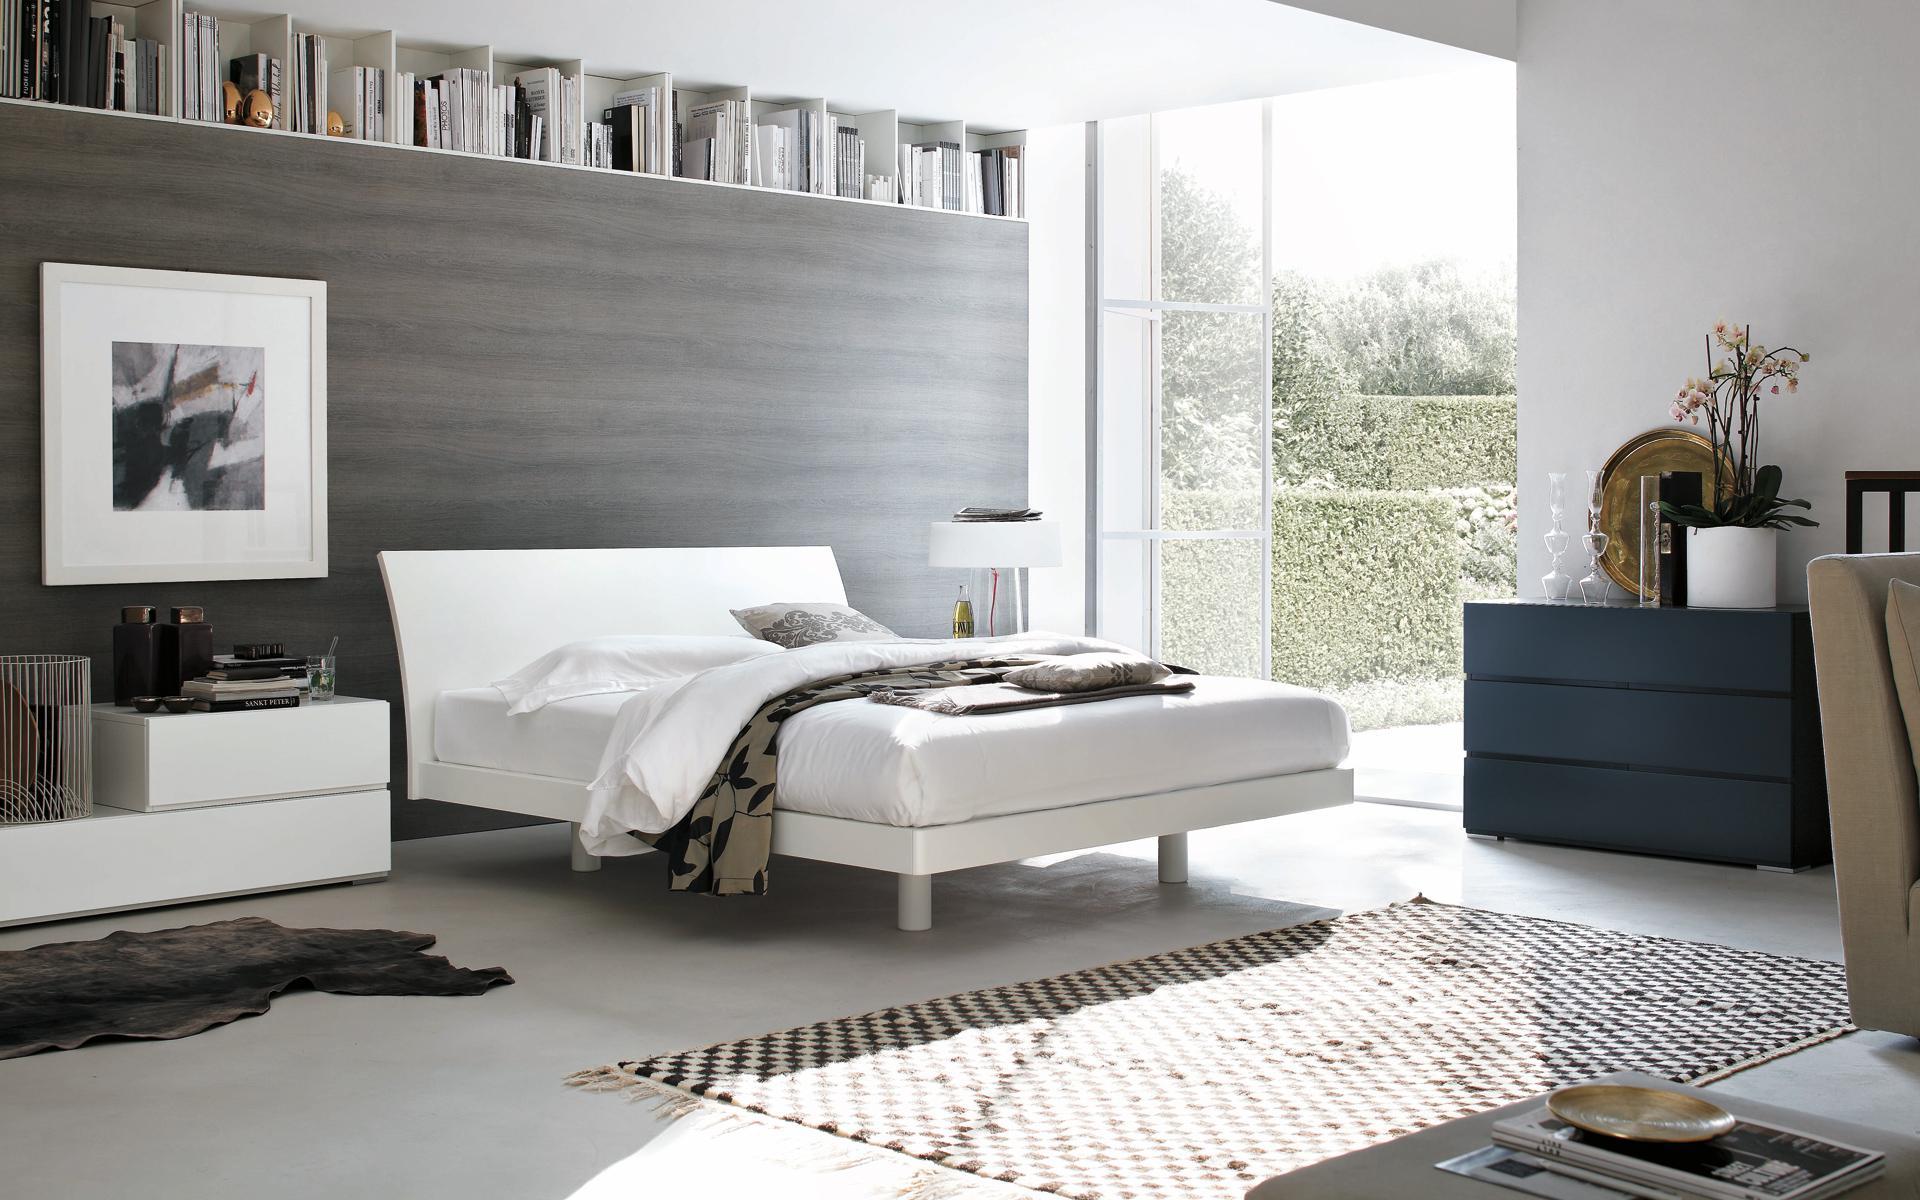 Arredo moderno apuzzo mobili dal 1953 - Camera da letto arredamento moderno ...